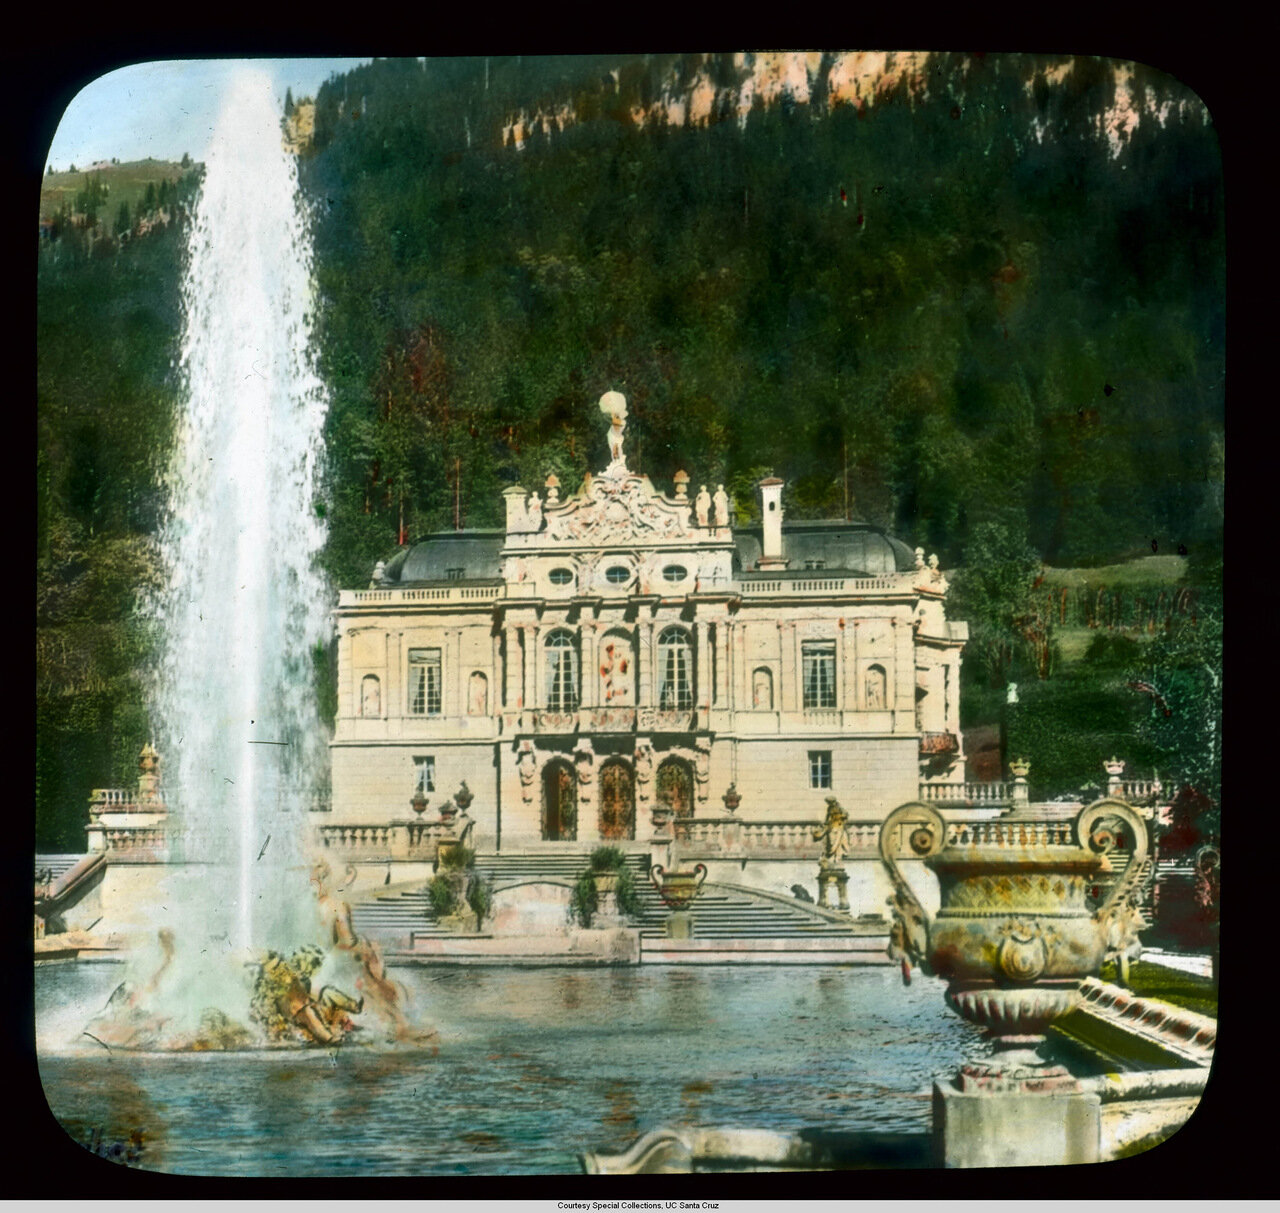 Бавария. Дворец Линдерхоф, фонтан Нептуна